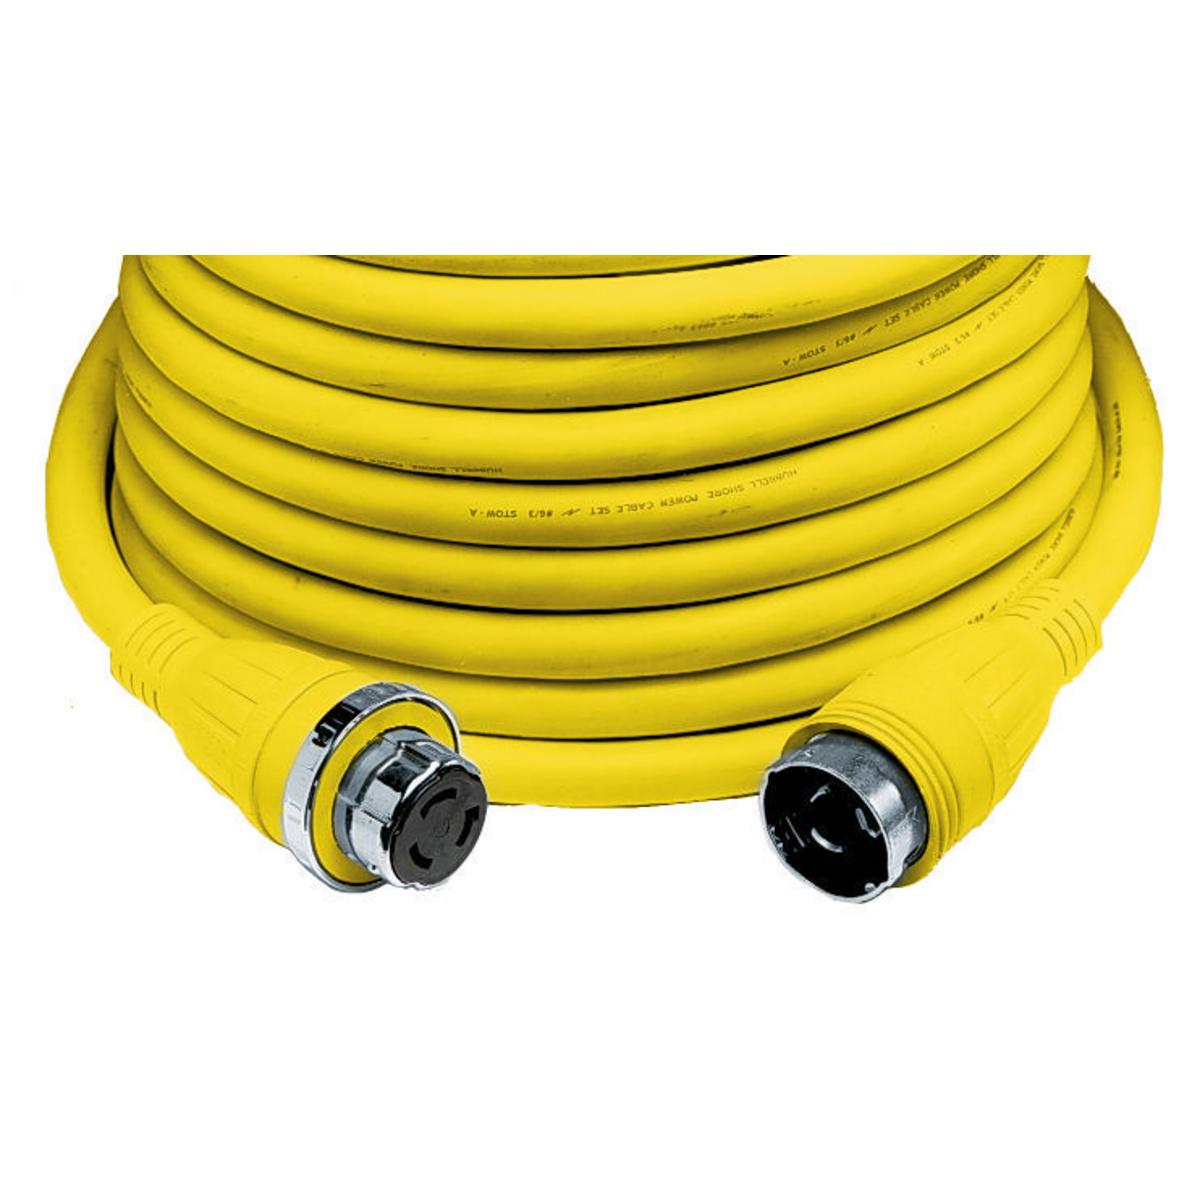 HW HBL61CM53 MARINE CABLE, 50', 50A125V, YL